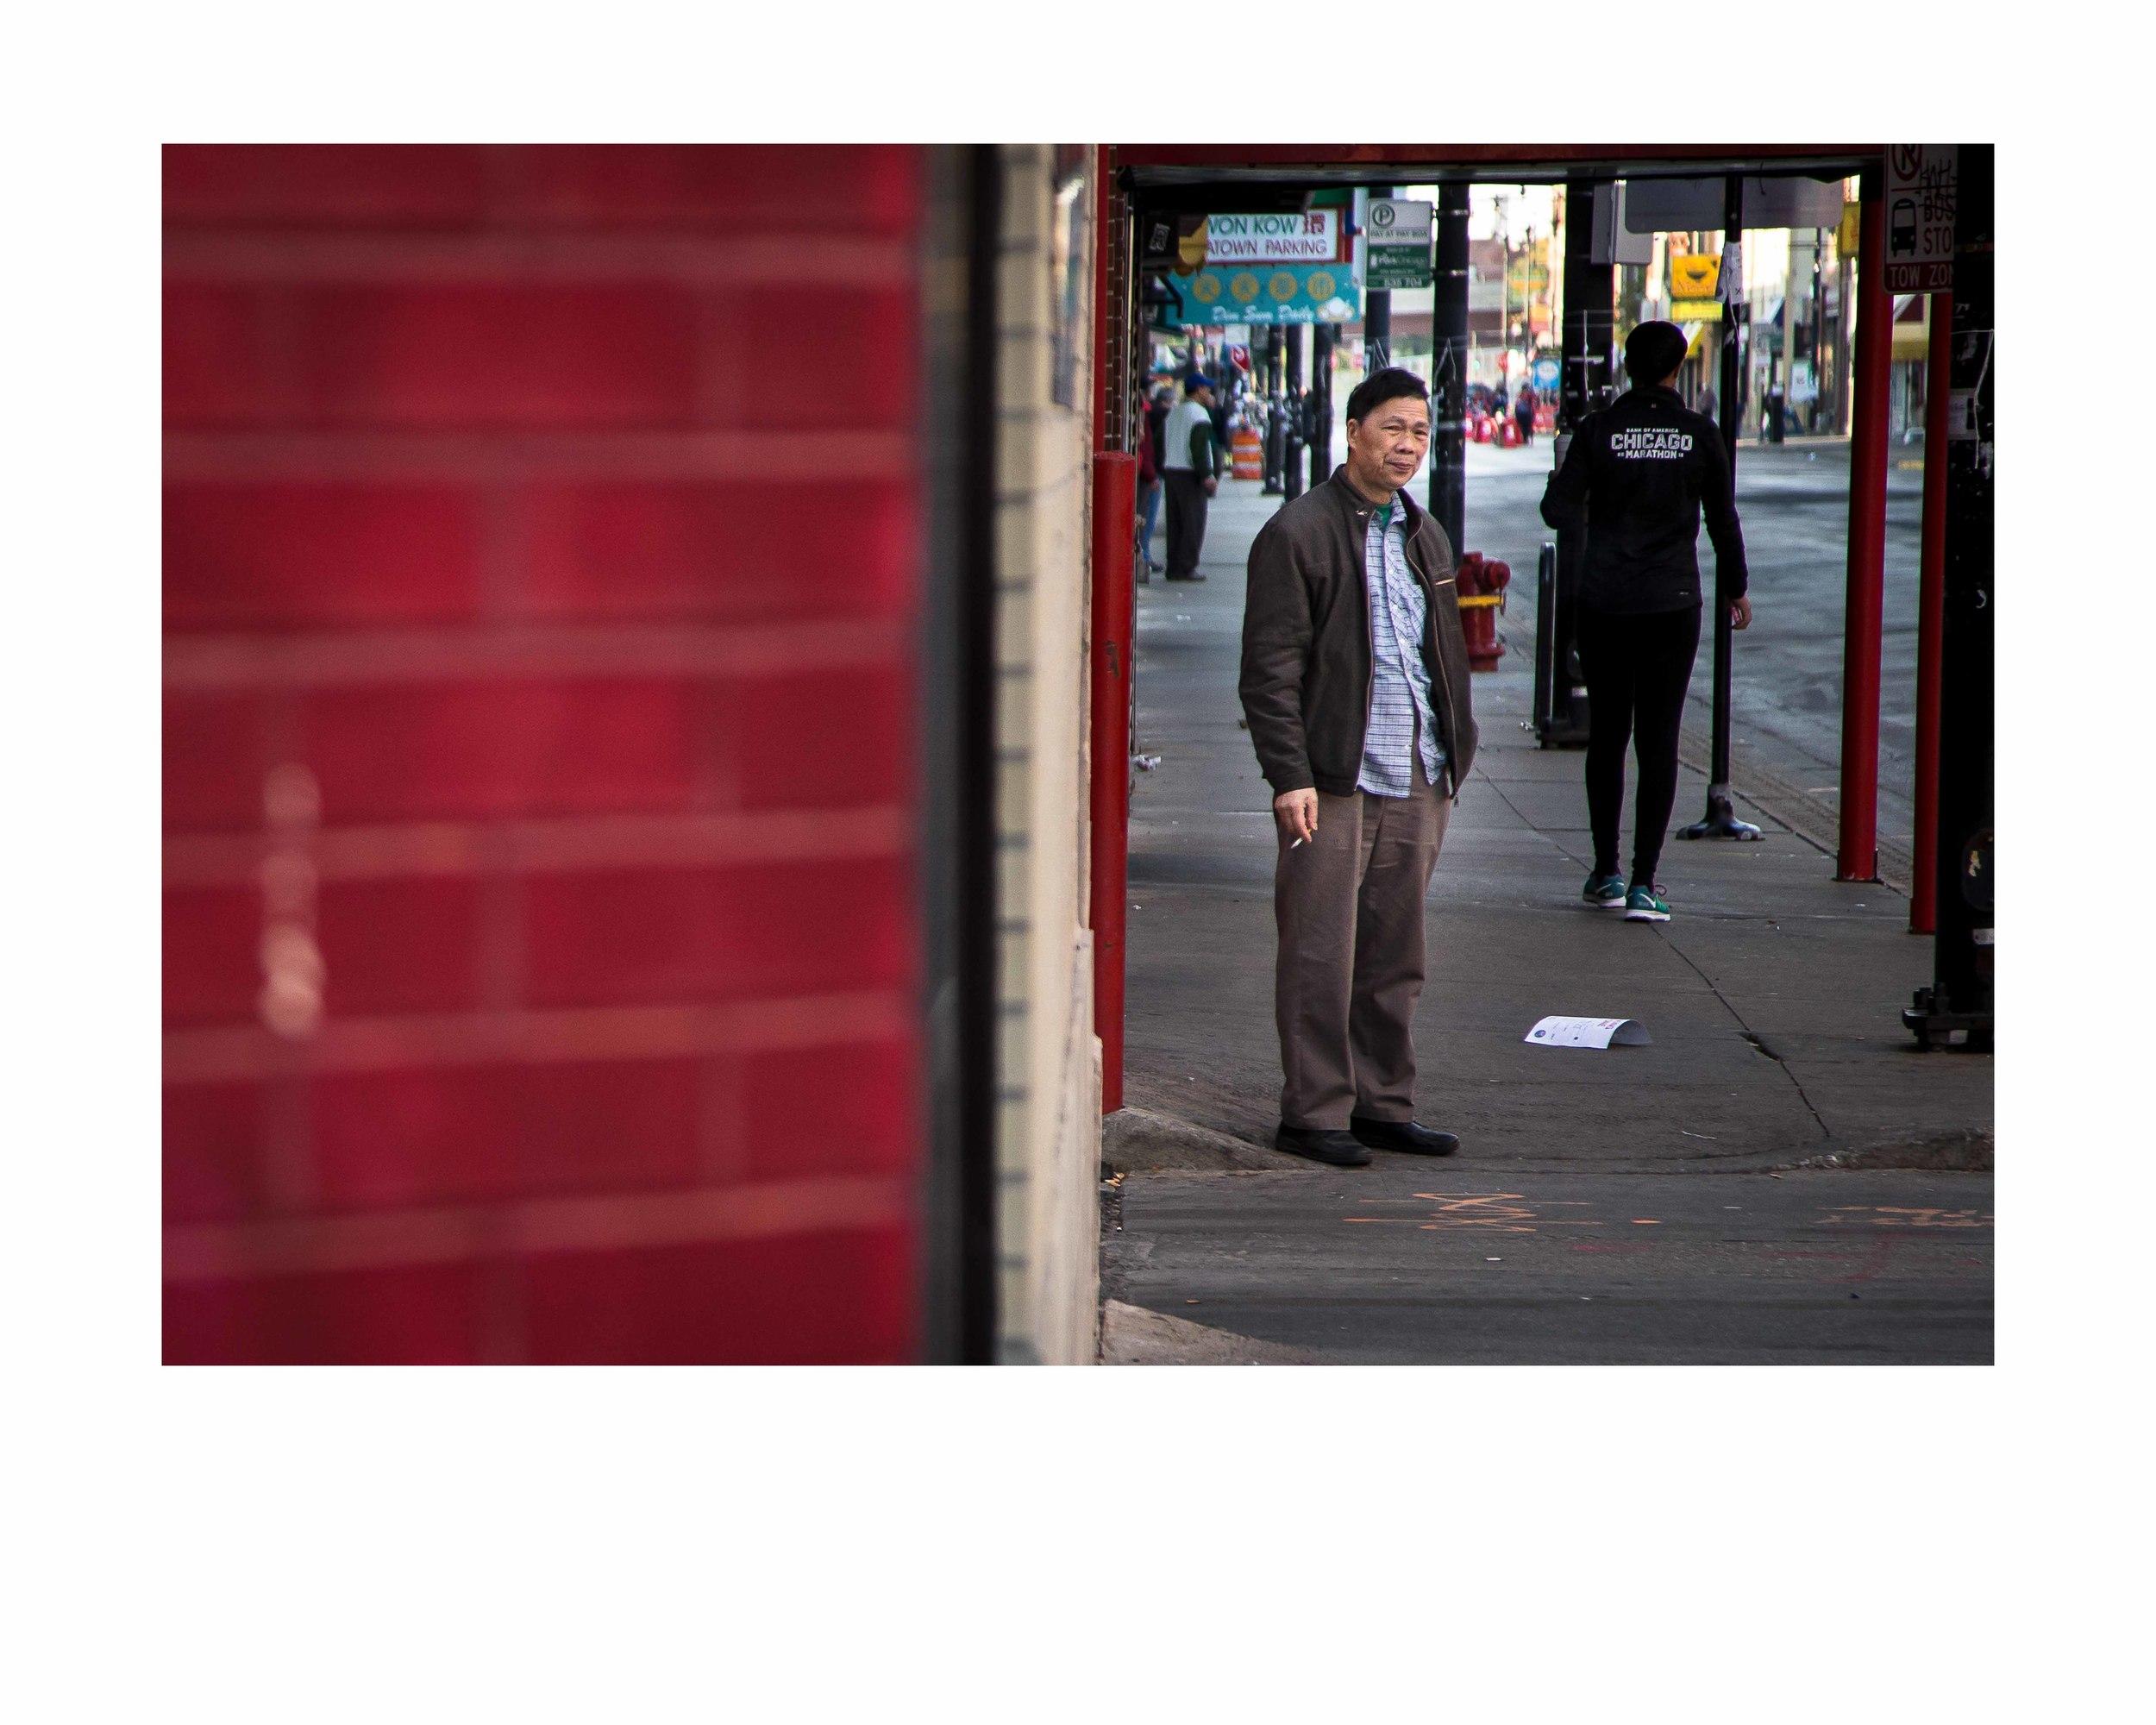 Chinatown.16x20 framed. $150